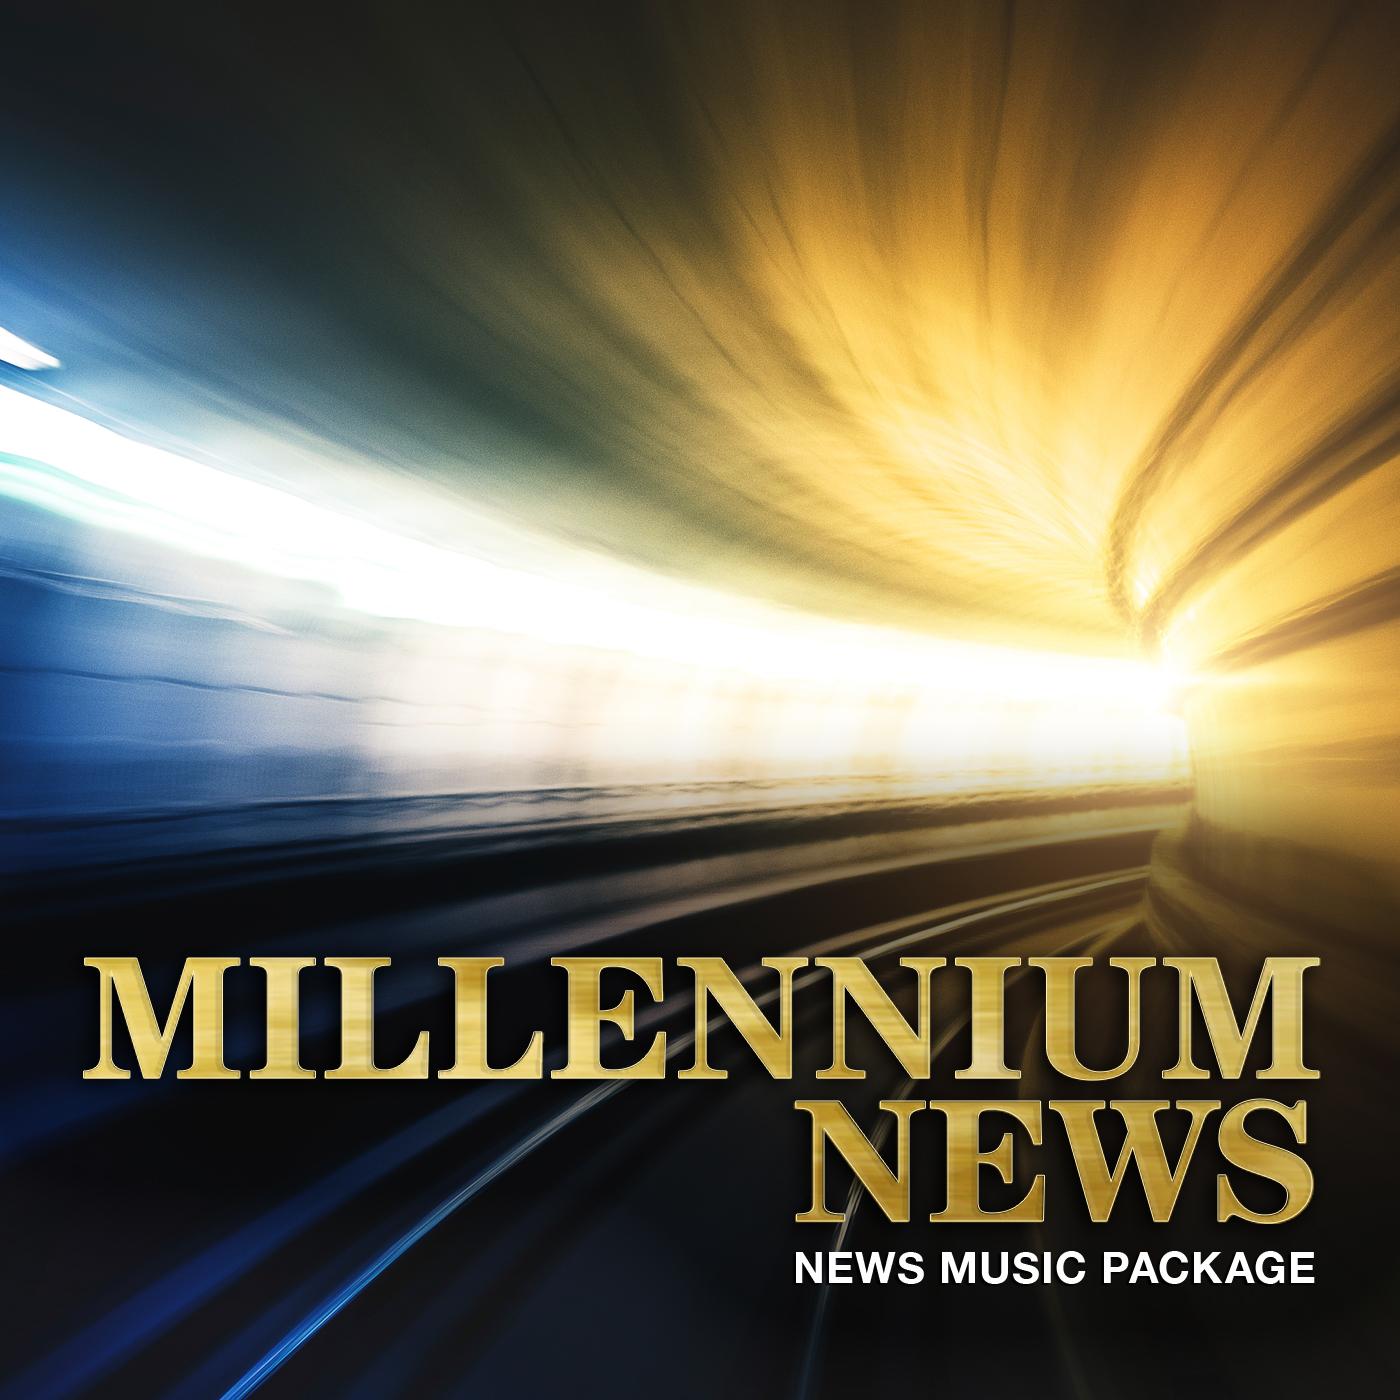 Millennium News Music Package